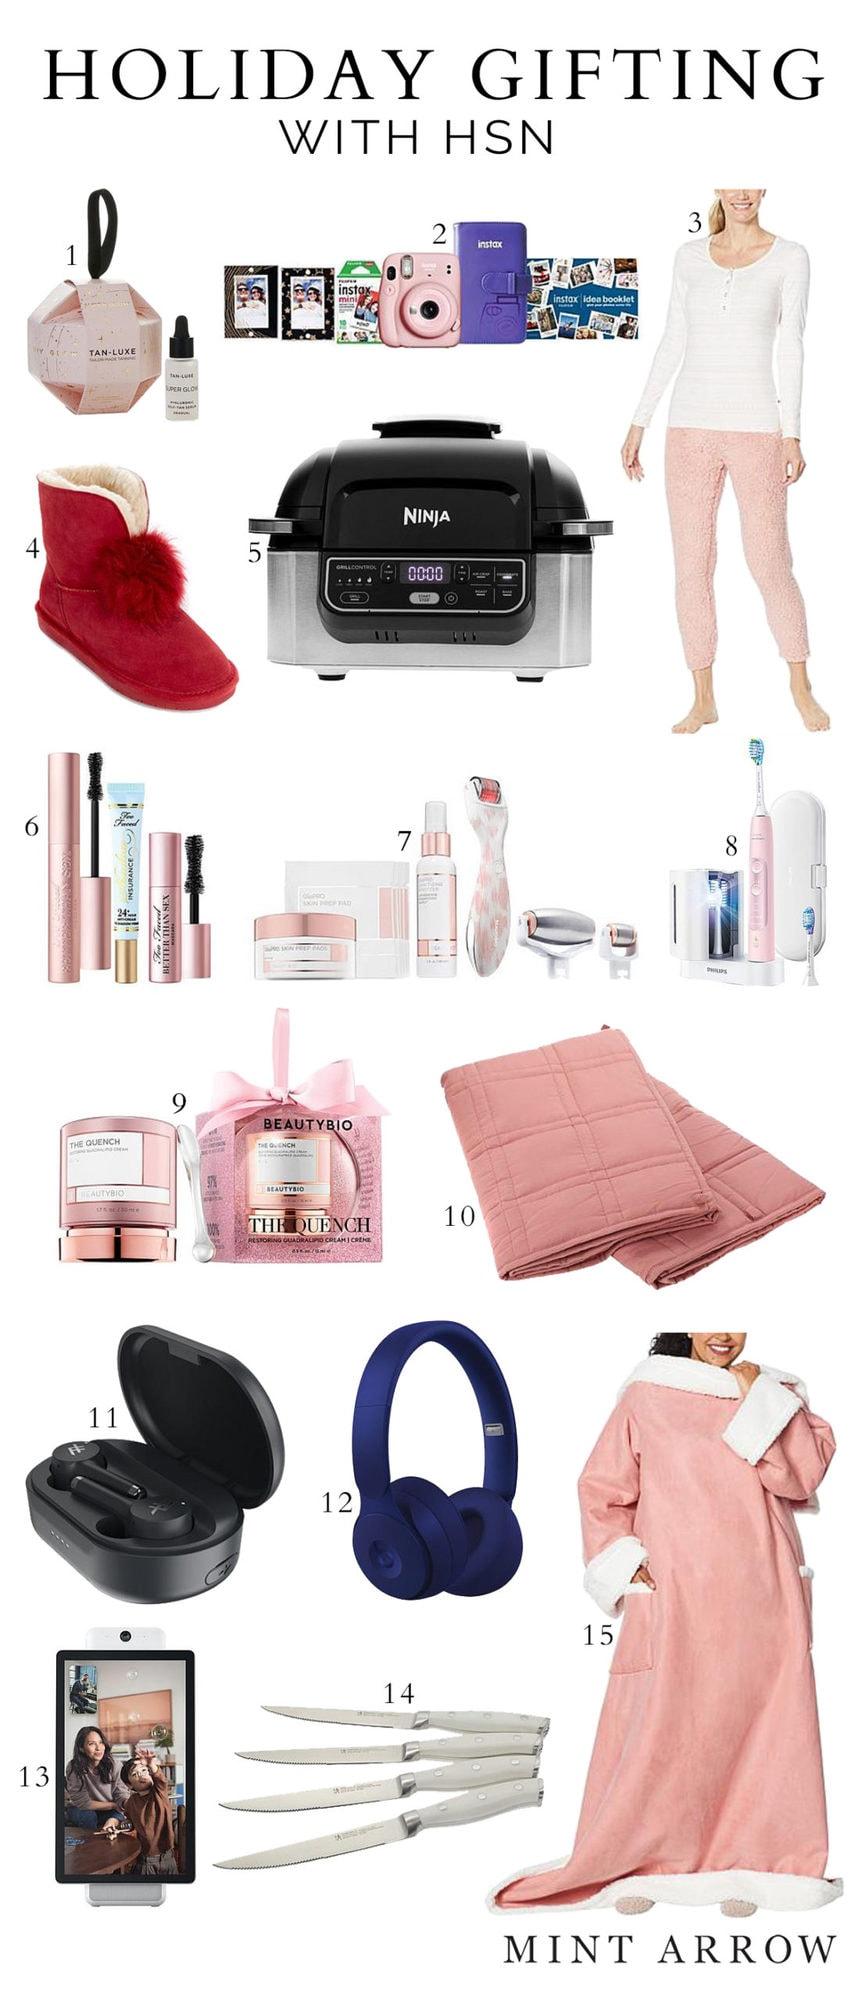 christmas gift ideas for men and women HSN